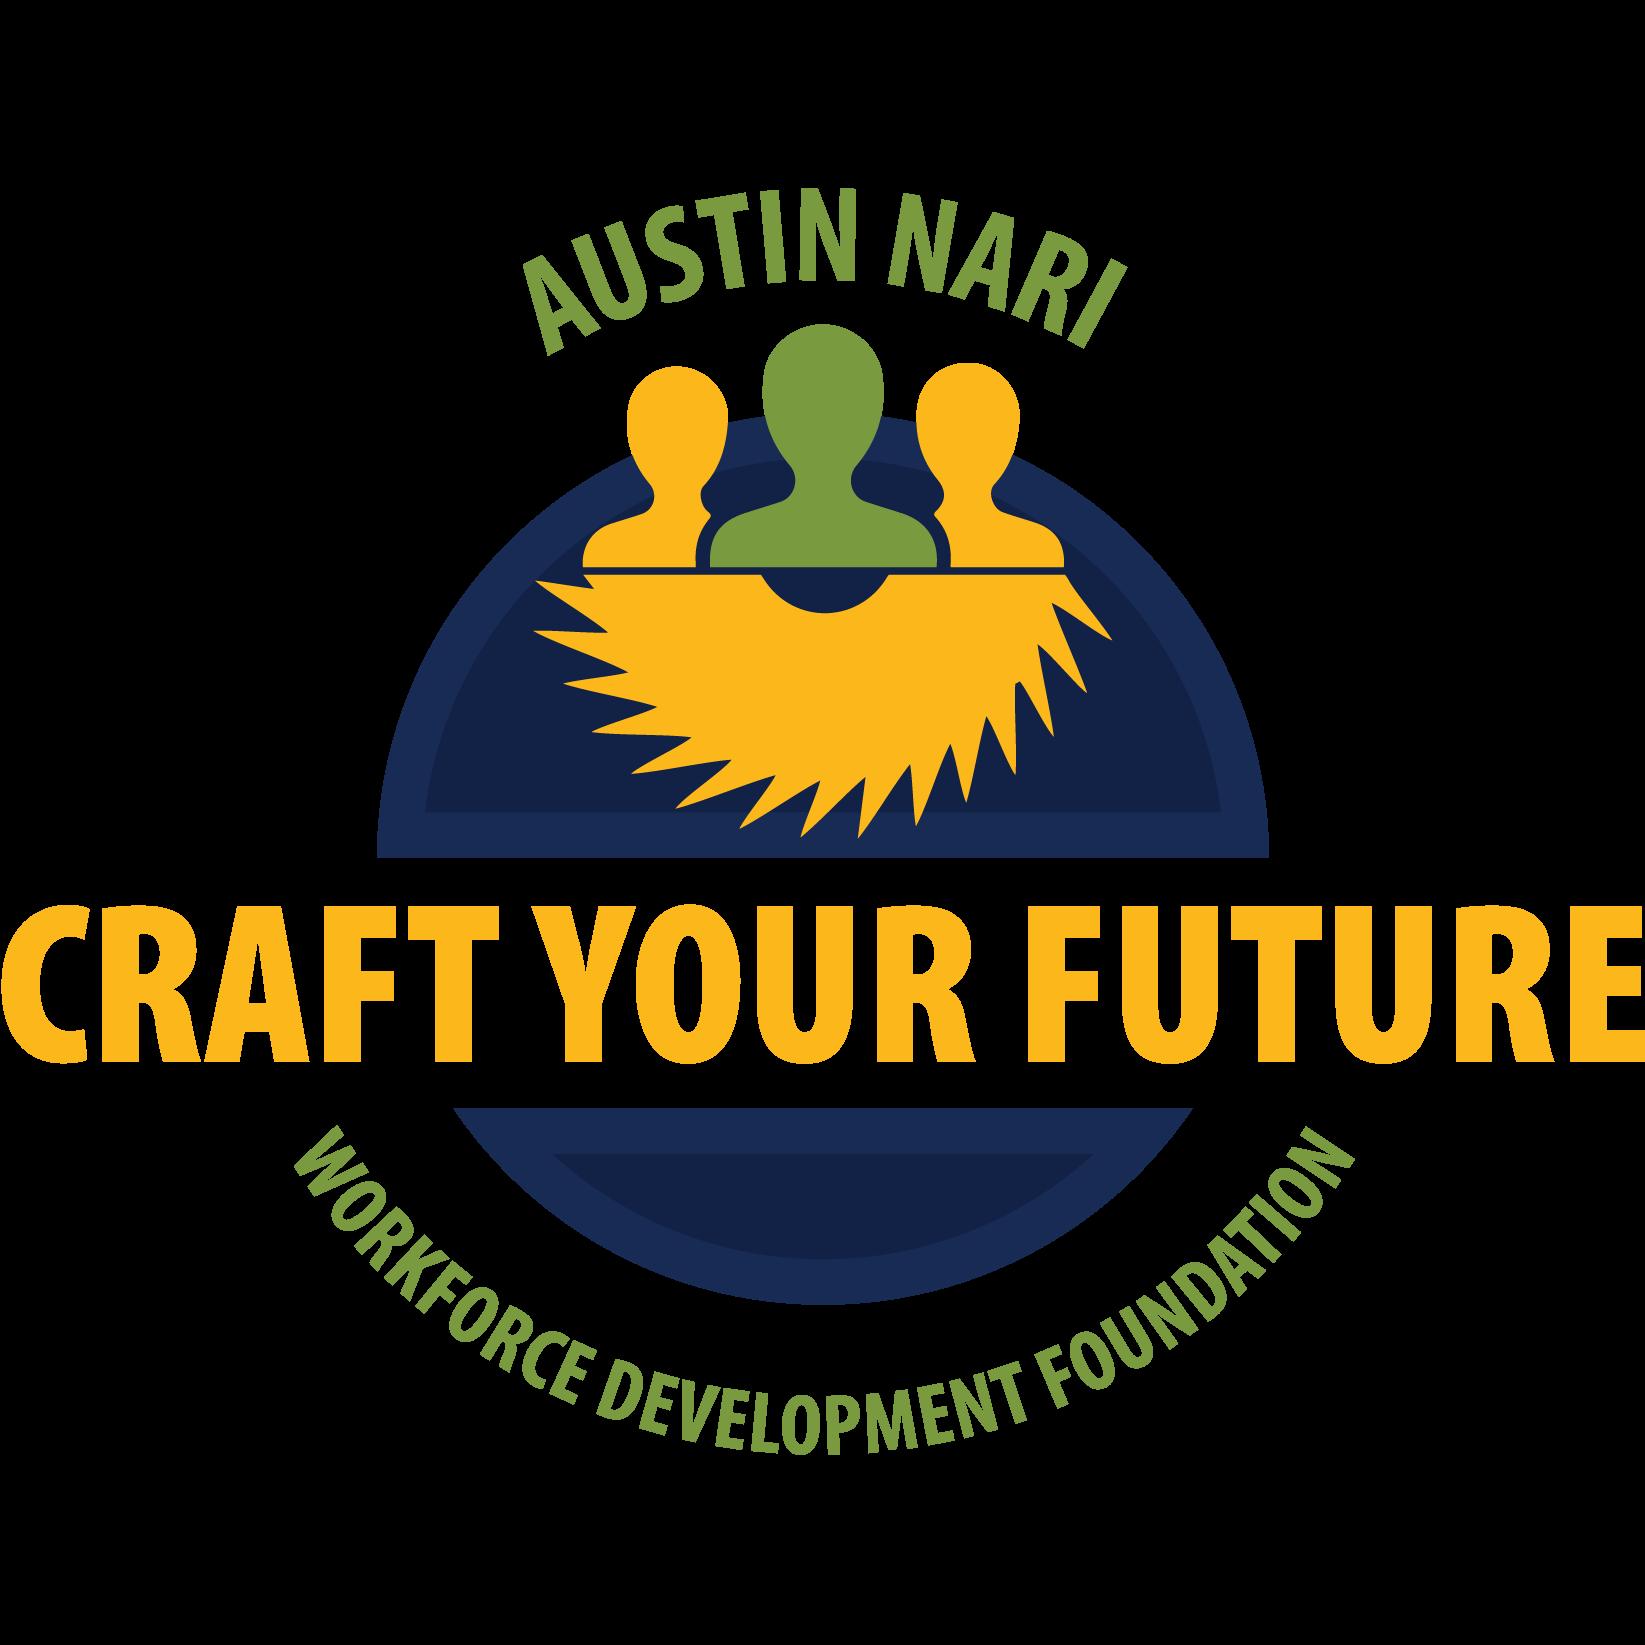 Austin NARI Workforce Development Foundation